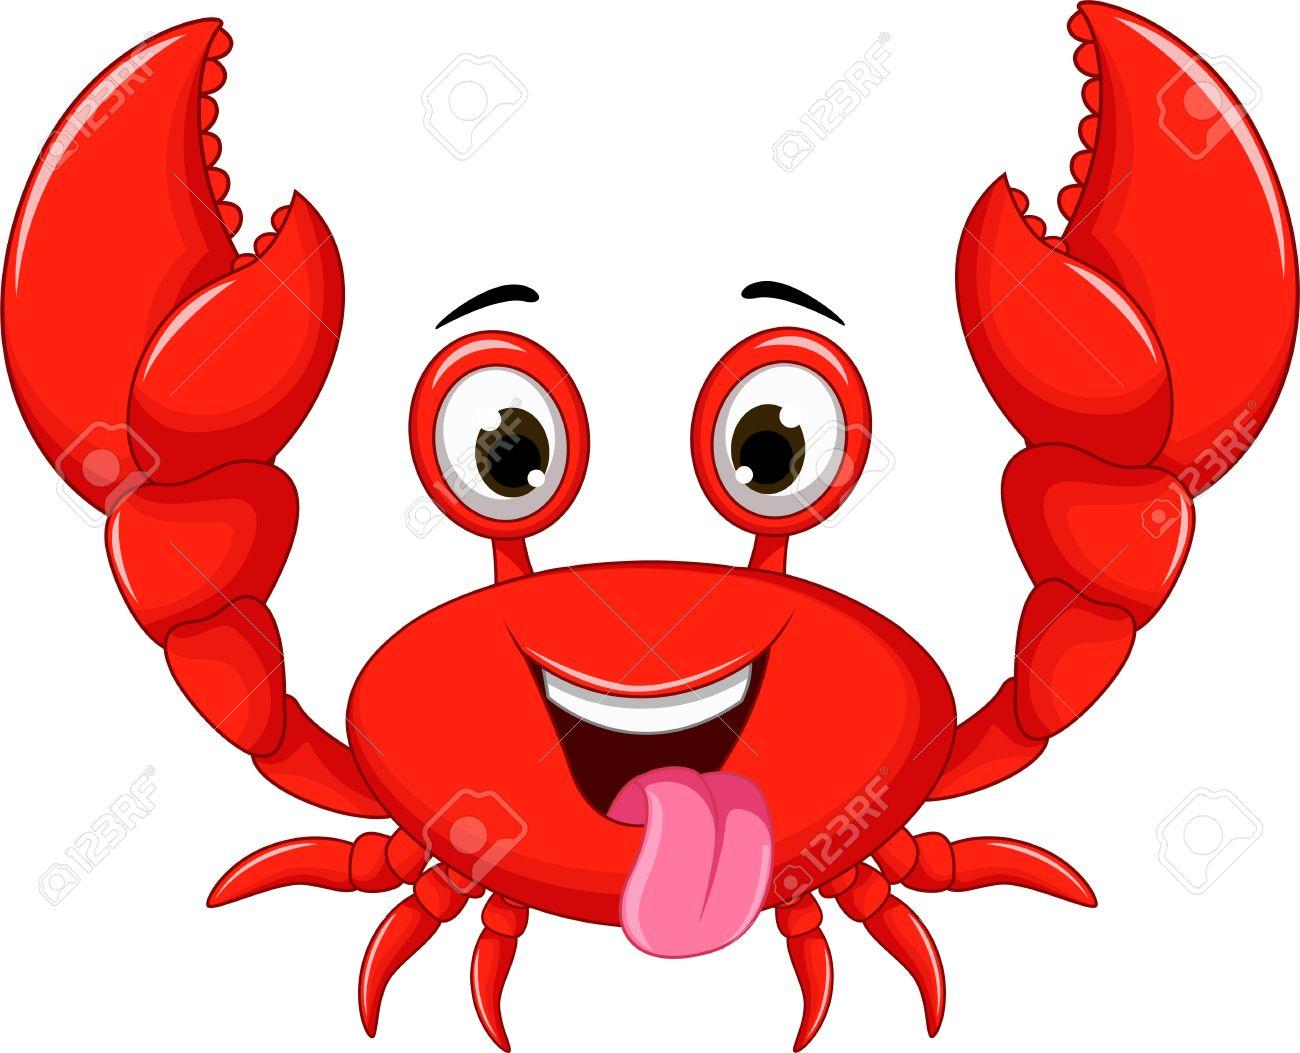 funny crab cartoon royalty free cliparts vectors and stock rh 123rf com Cartoon Fish hermit crab cartoon pictures